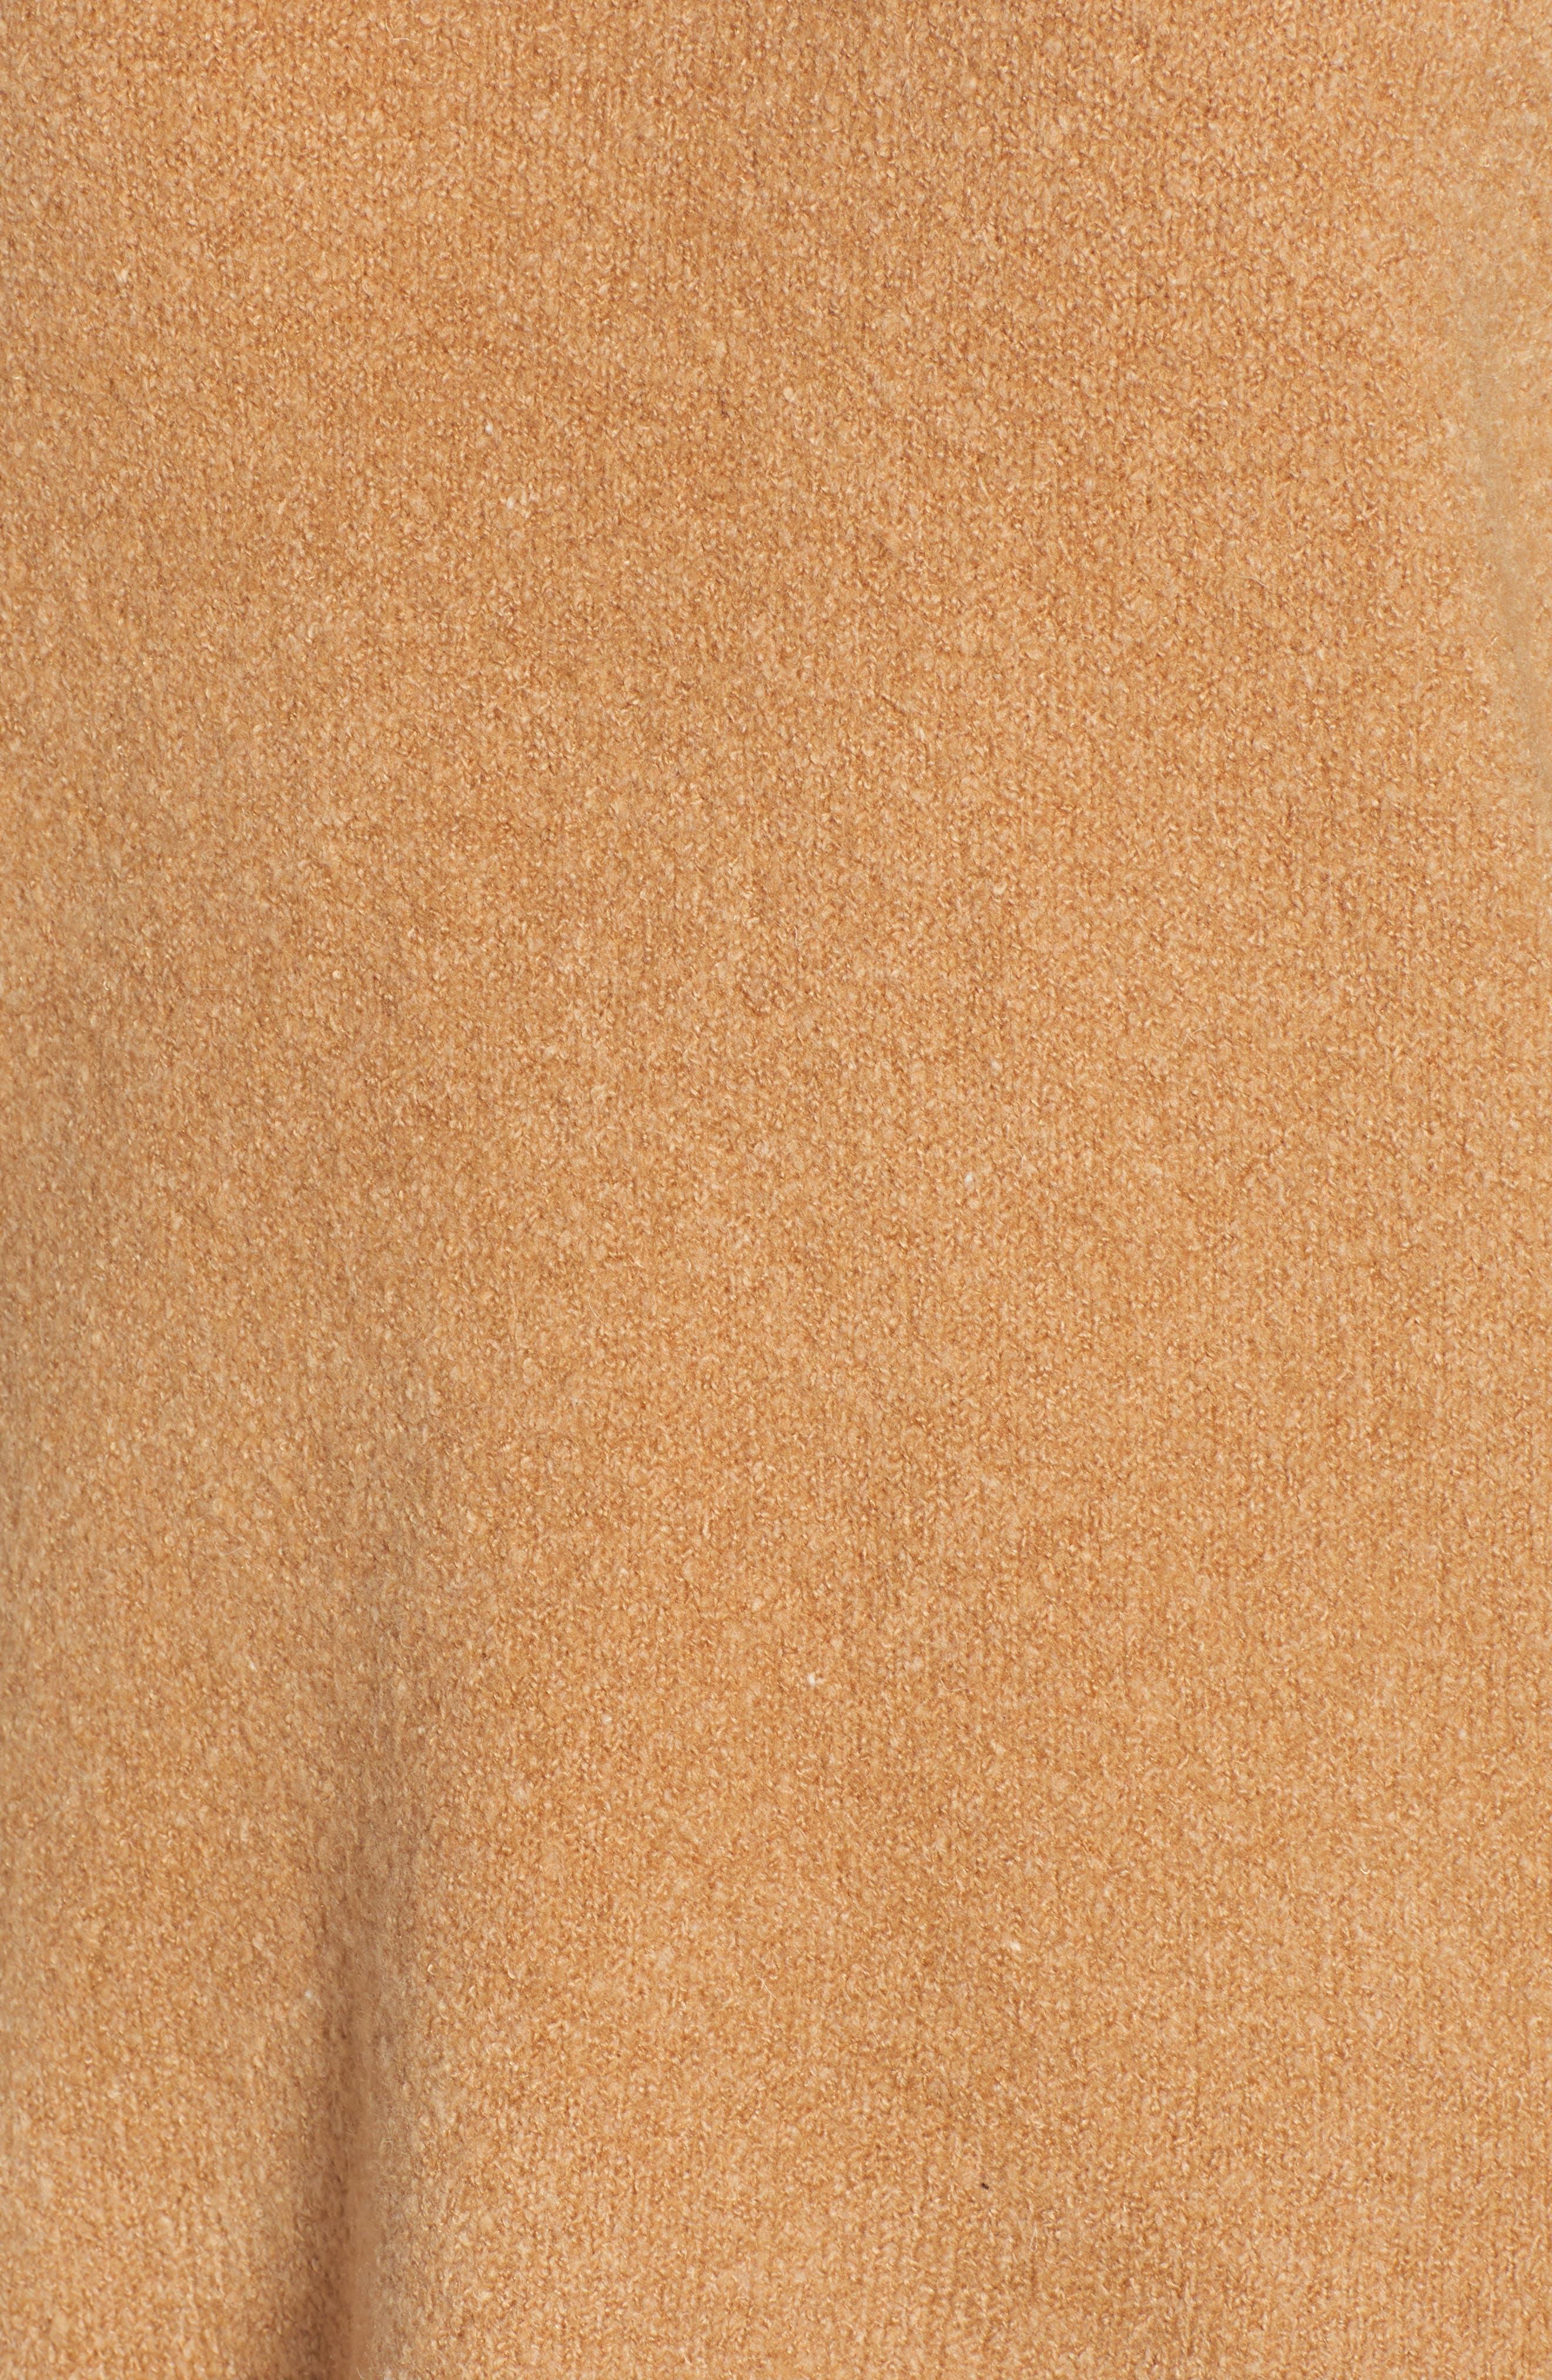 Cowl Neck Sweater,                             Alternate thumbnail 5, color,                             CAMEL MEL